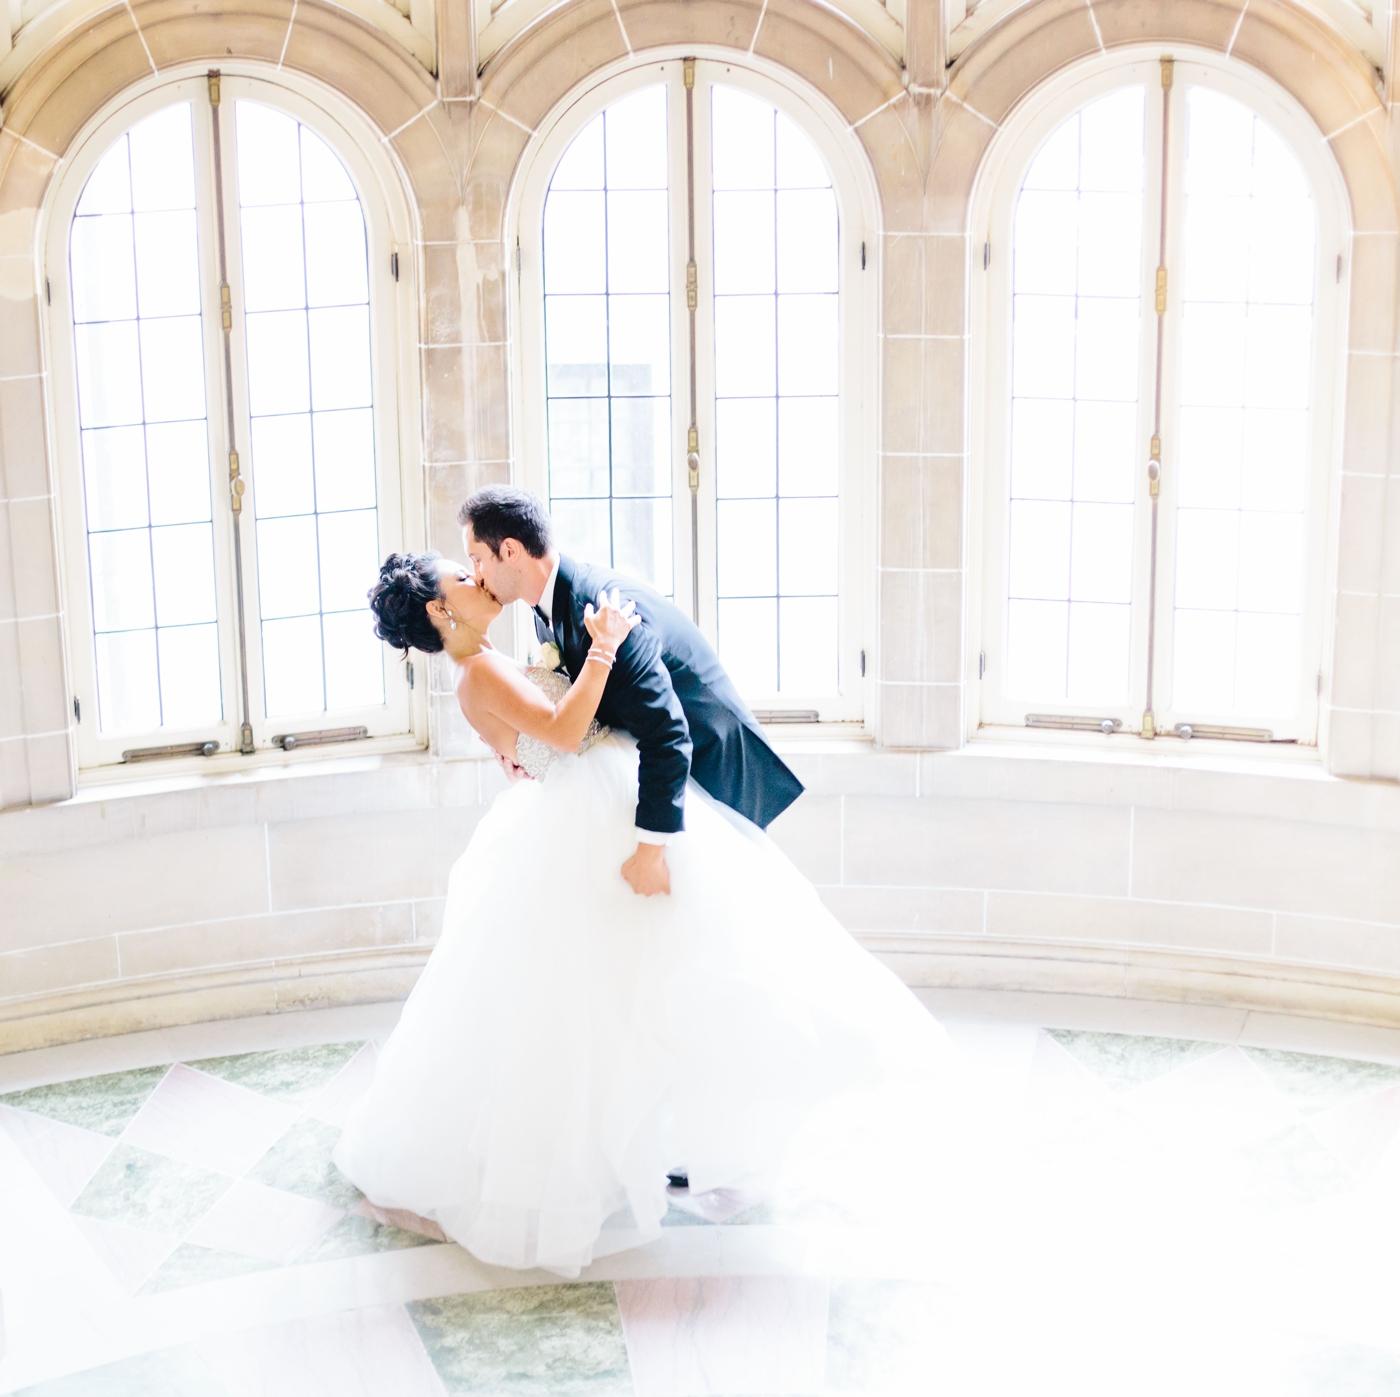 chicago-fine-art-wedding-photography-smeja47